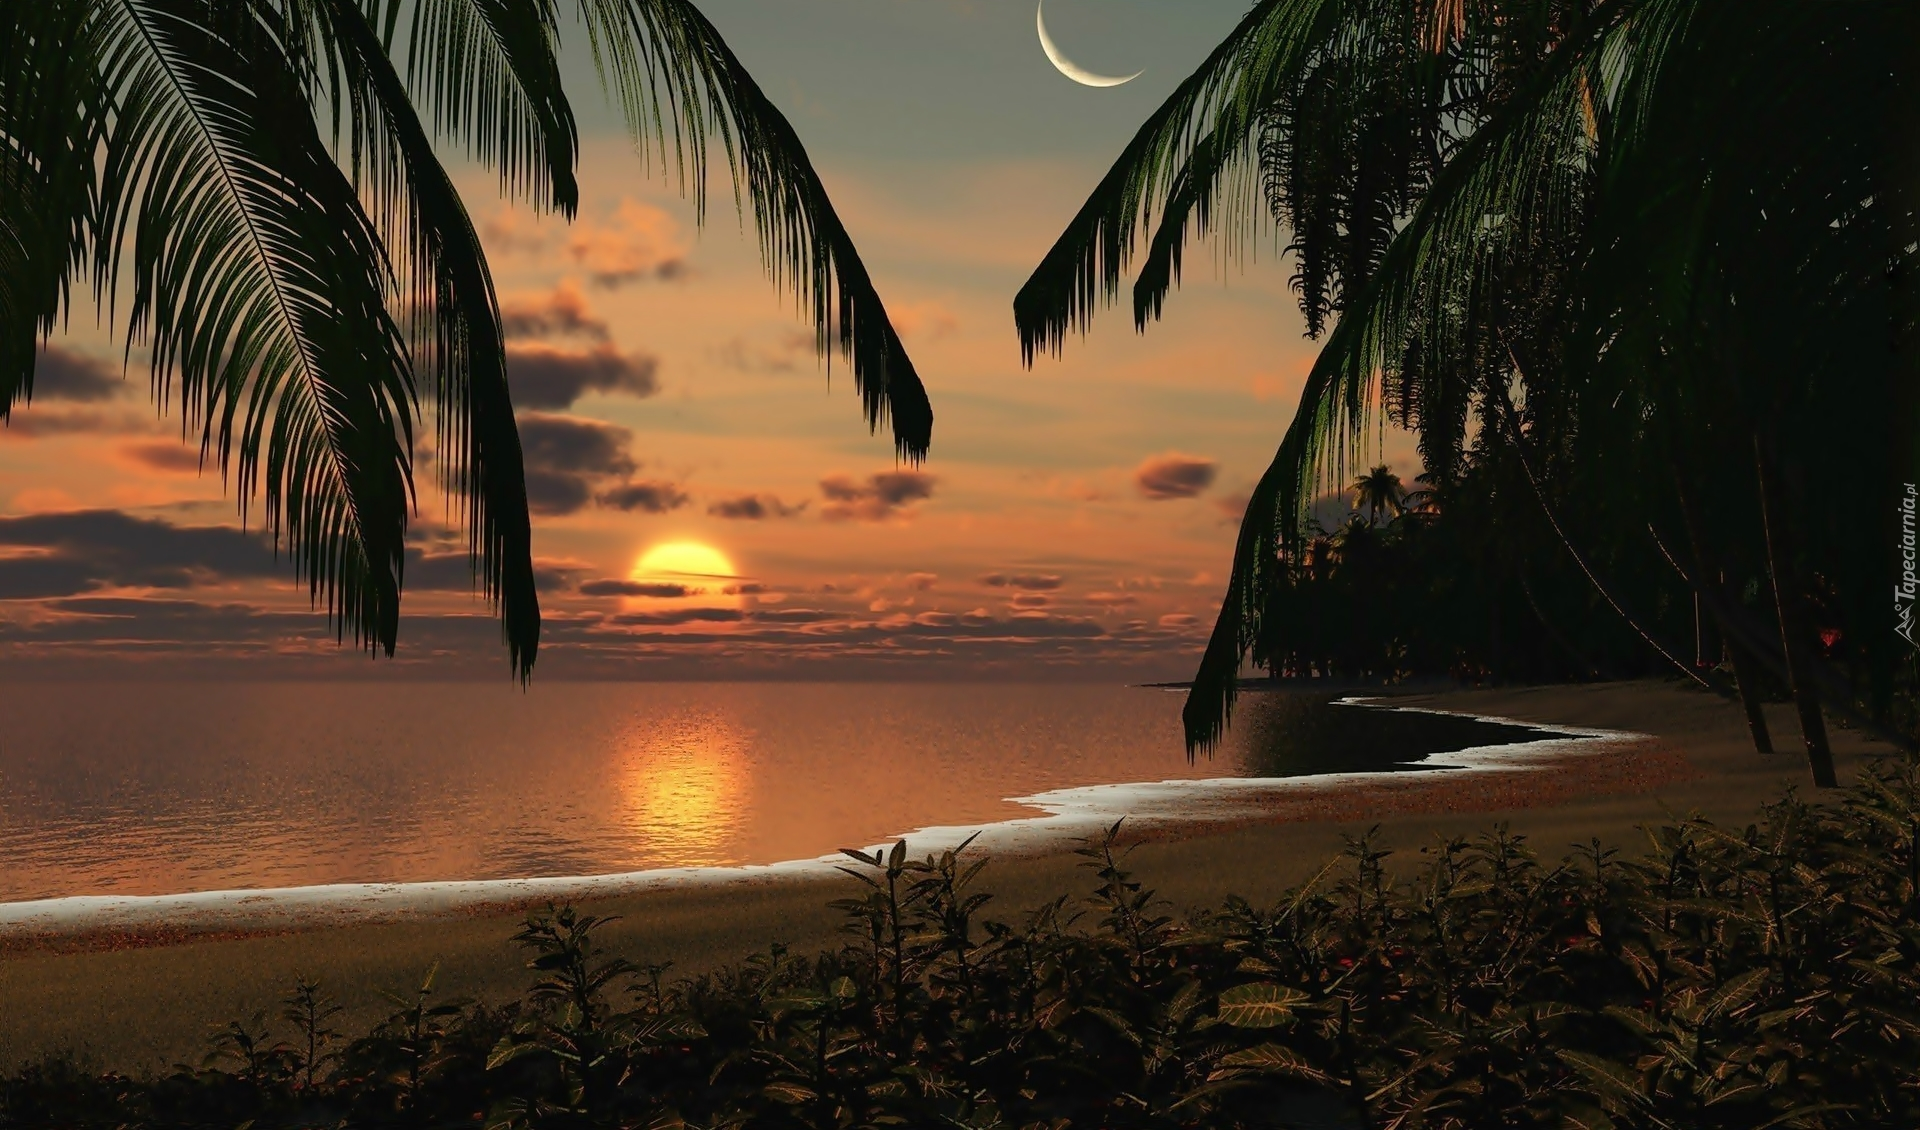 Good Night 3d Moving Wallpaper Zach 243 D Słońca Palmy Księżyc